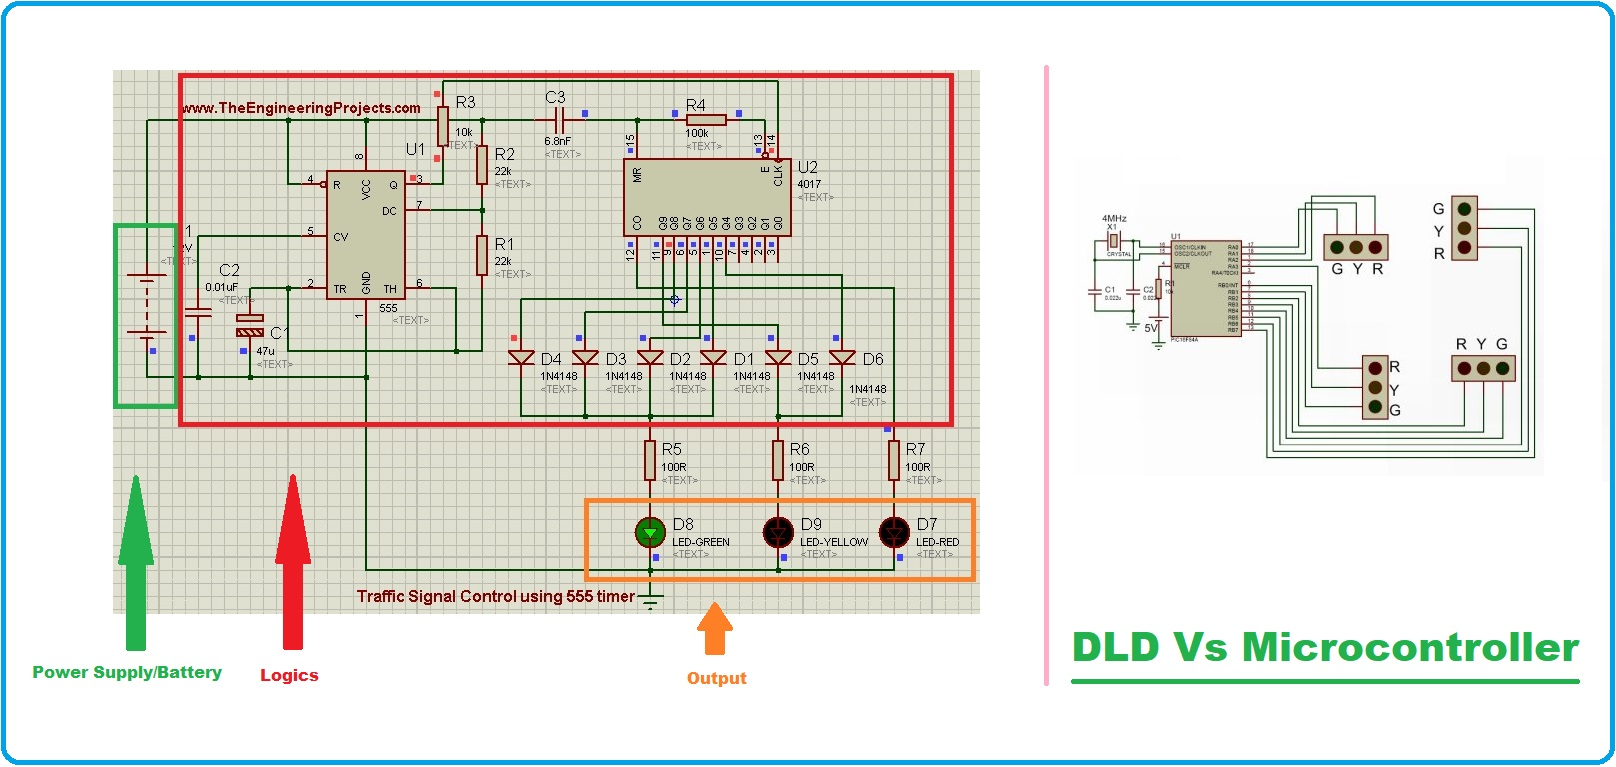 Microcontroller , Microcontroller Programming, Microcontroller types, types of Microcontroller, Microcontroller examples, Microcontroller applications, Microcontroller vs microprocessor, Microcontroller applications